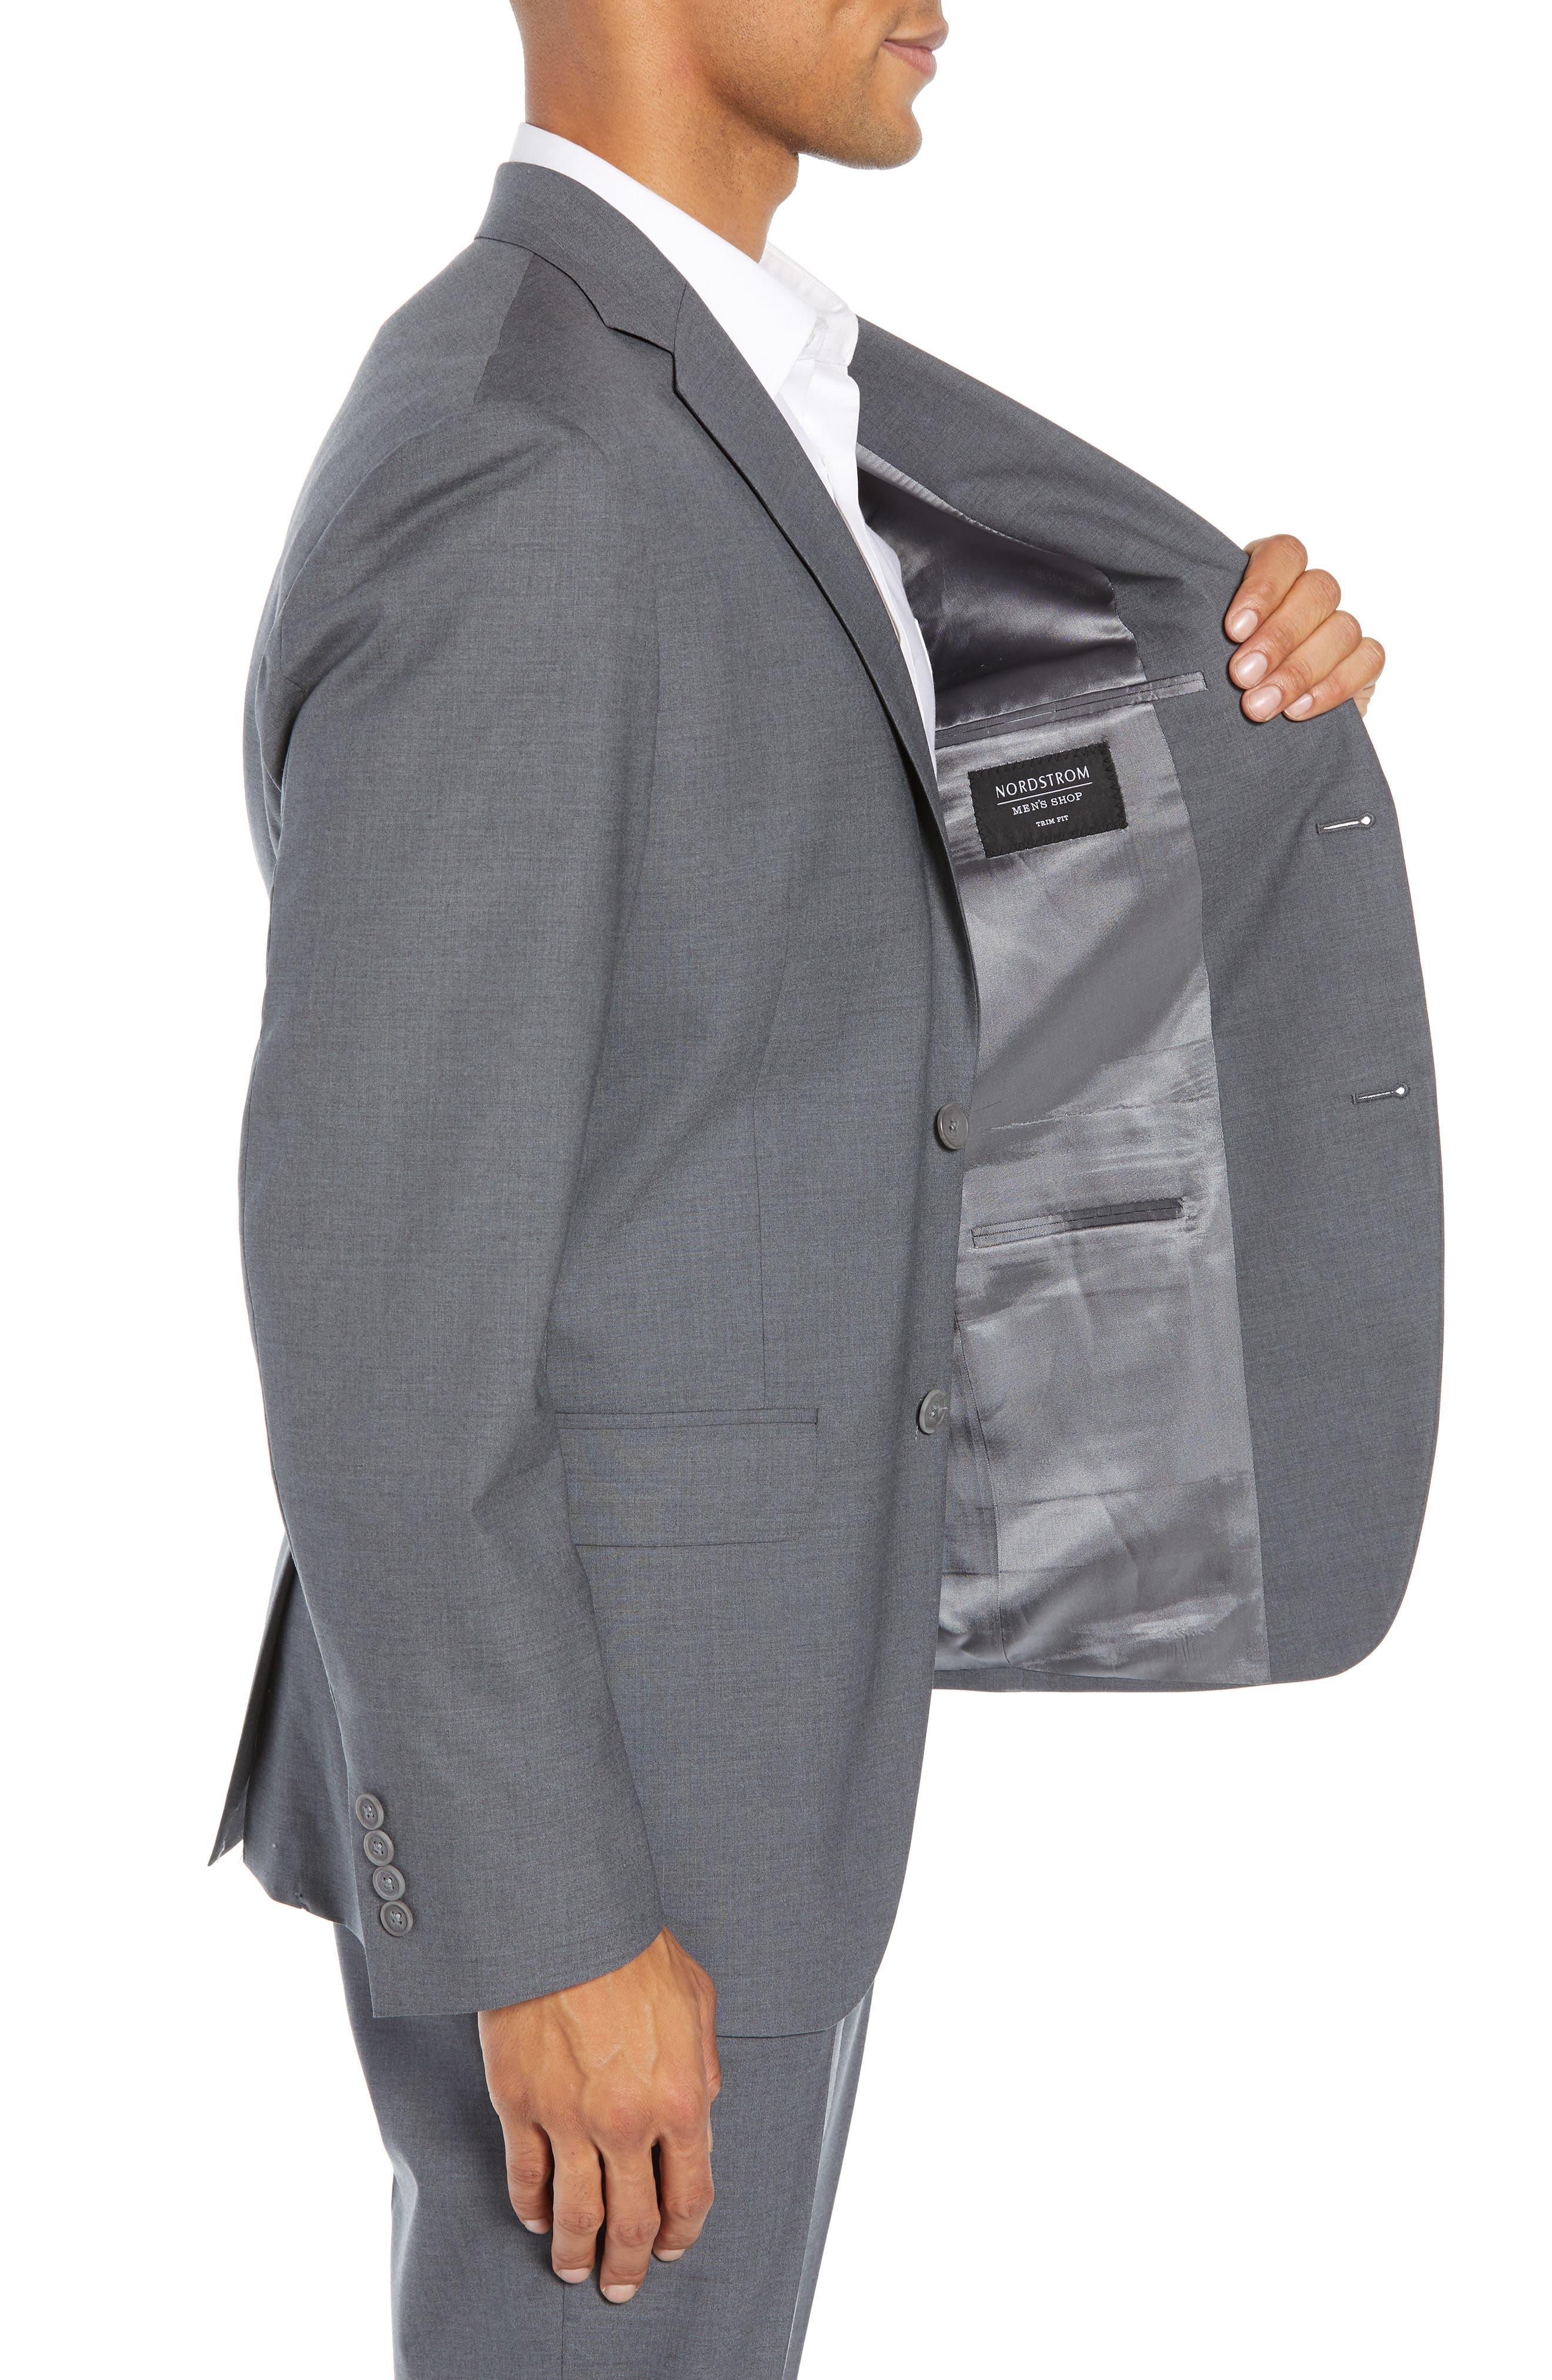 NORDSTROM MEN'S SHOP,                             Tech-Smart Trim Fit Stretch Wool Travel Sport Coat,                             Alternate thumbnail 3, color,                             GREY